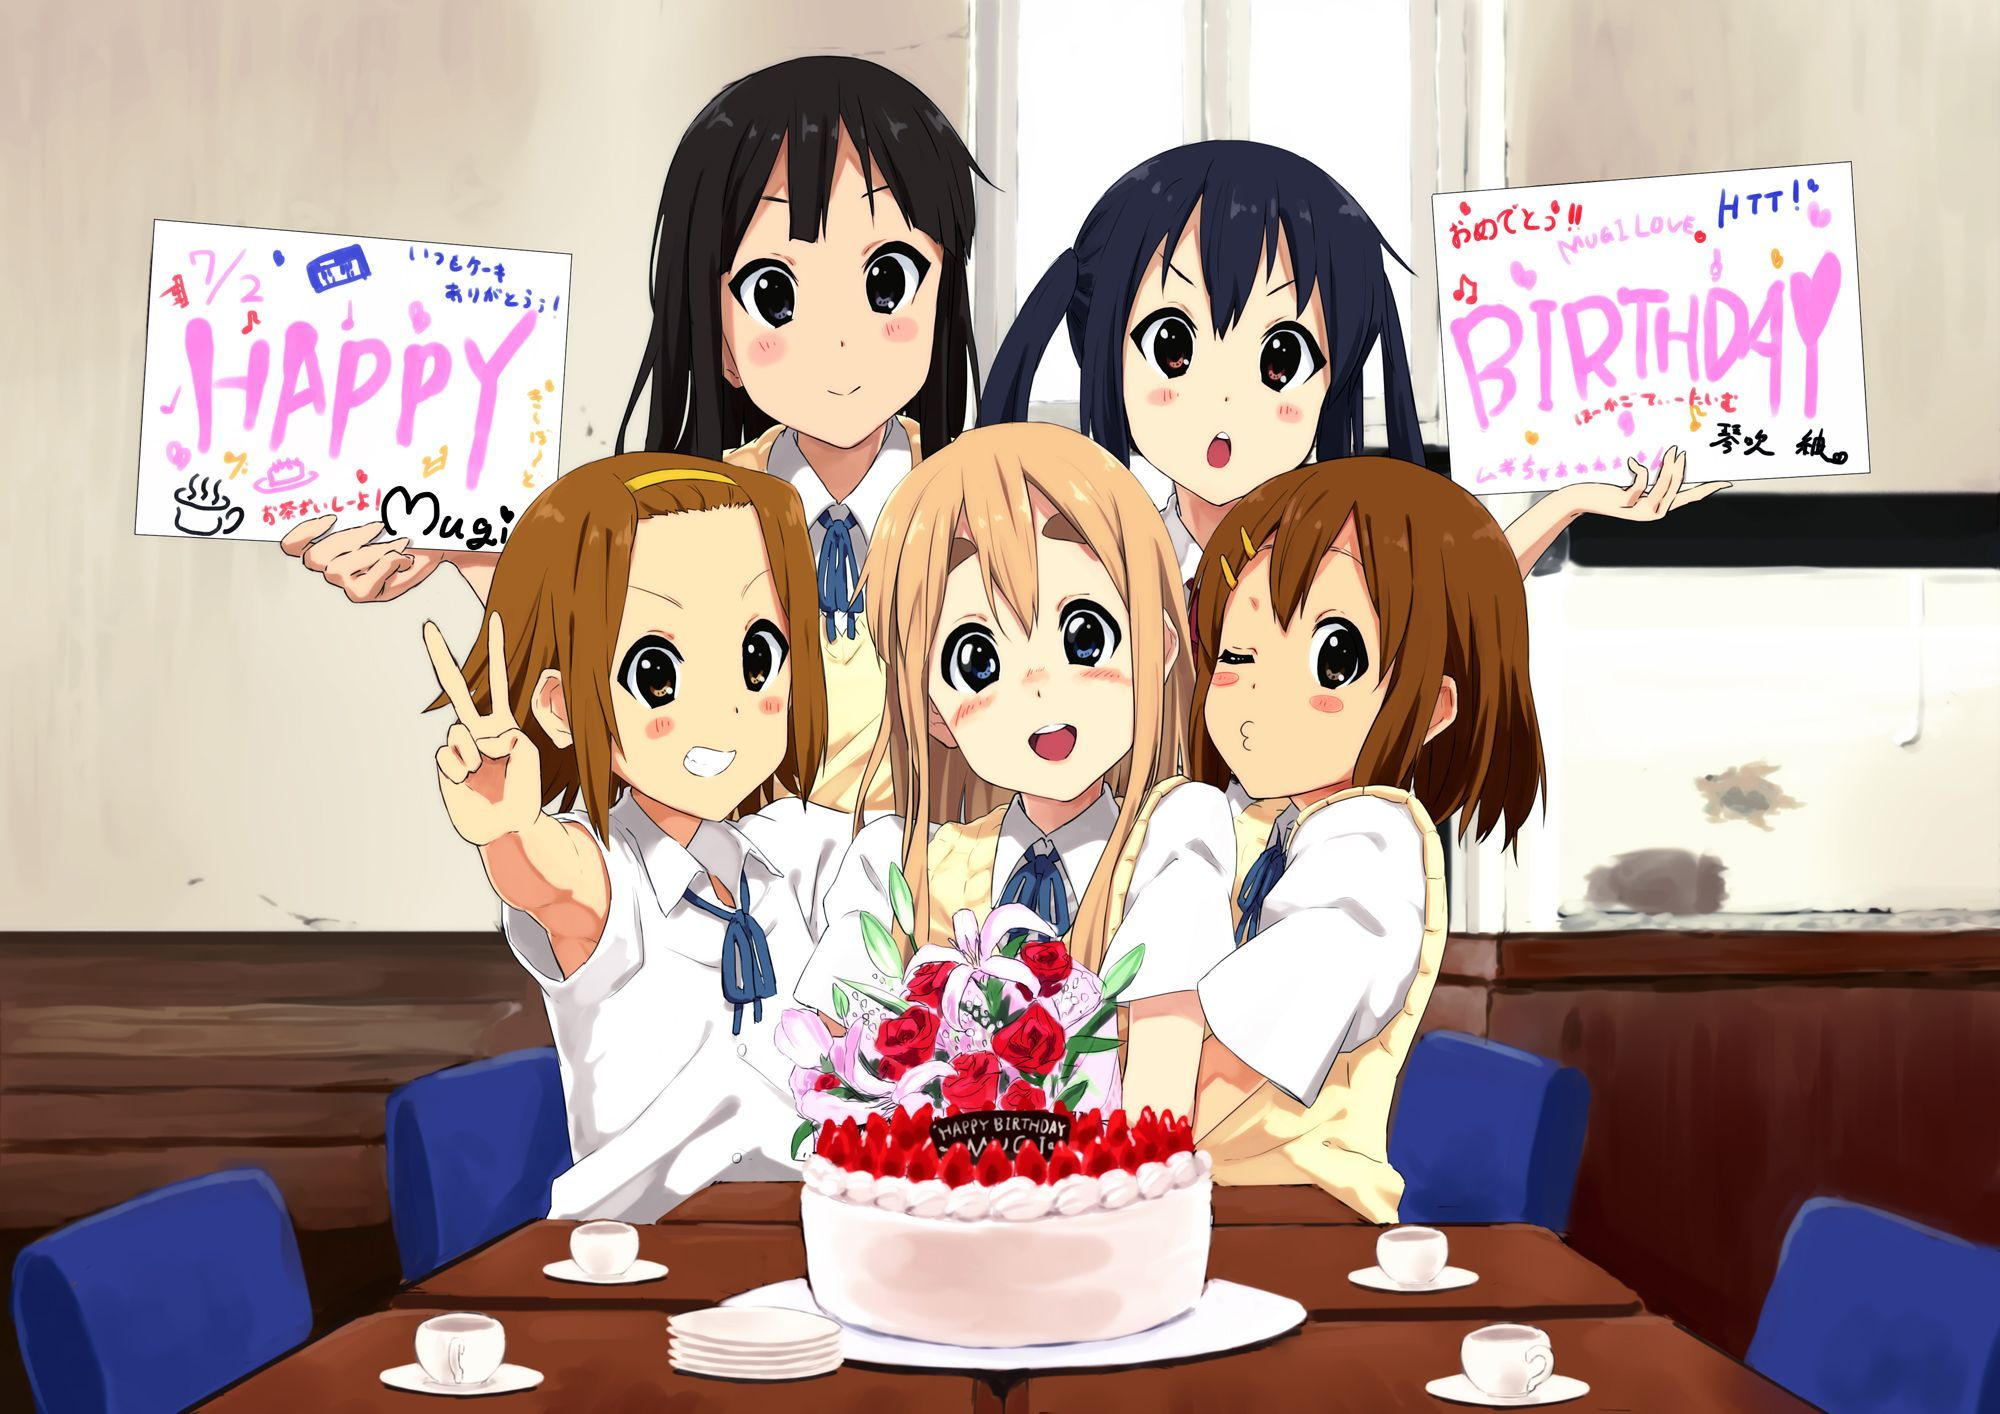 Happy Birthday Anime Wallpapers - Top Free Happy Birthday Anime Backgrounds  - WallpaperAccess